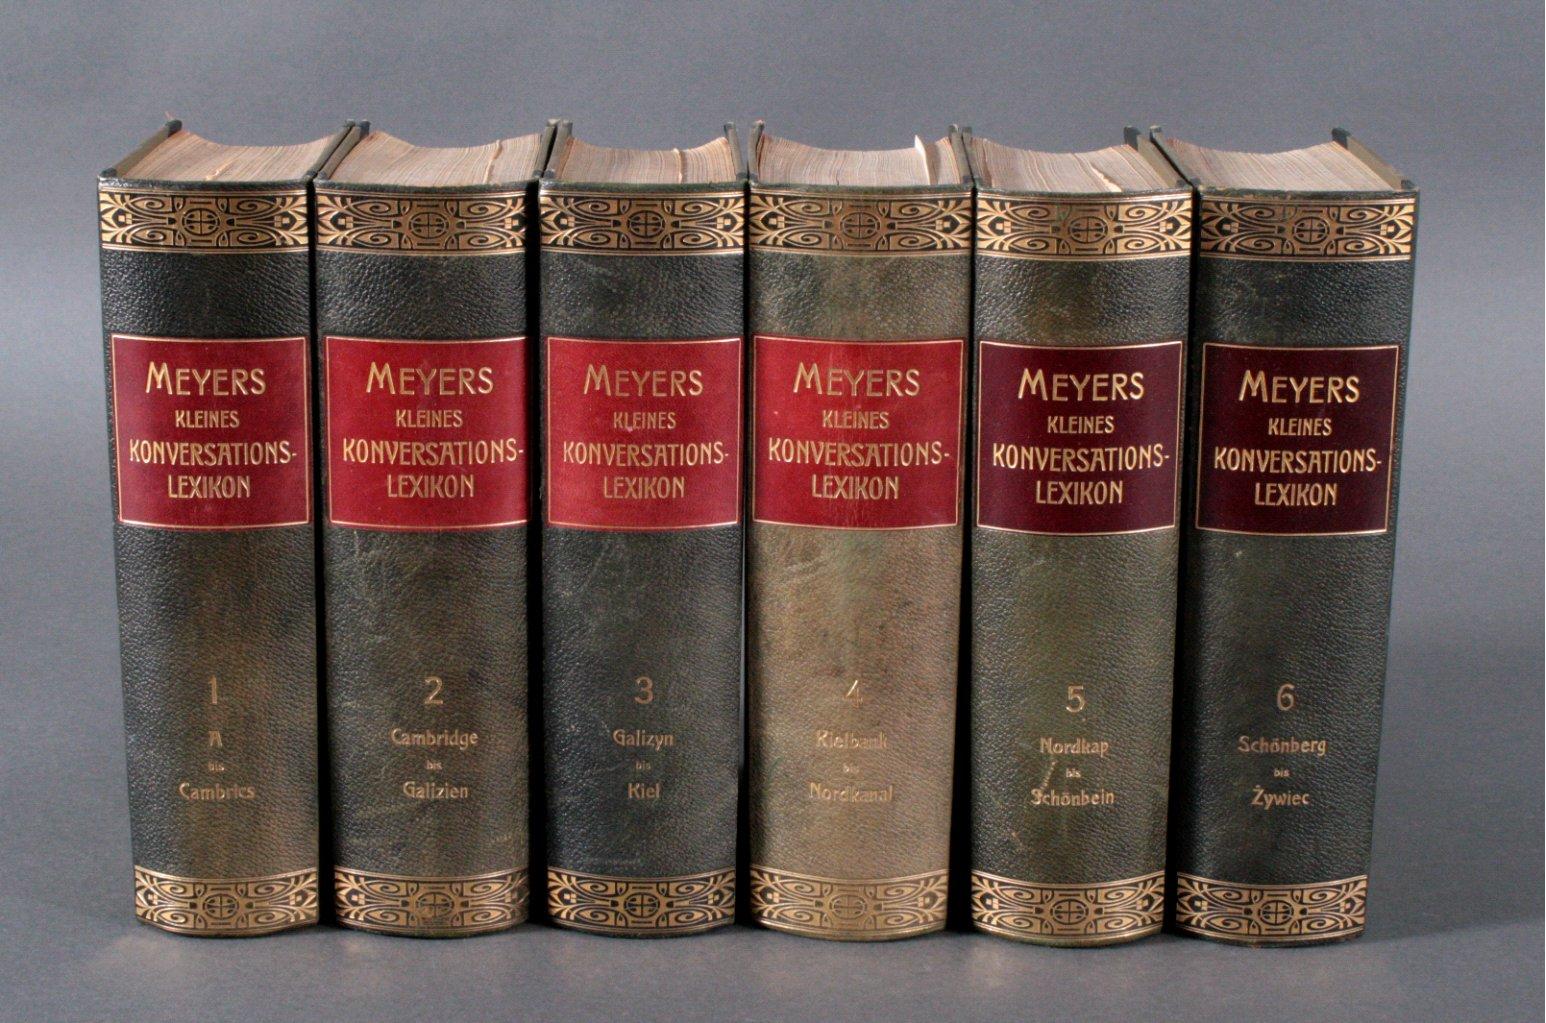 Meyers kleines Konversationslexikon,